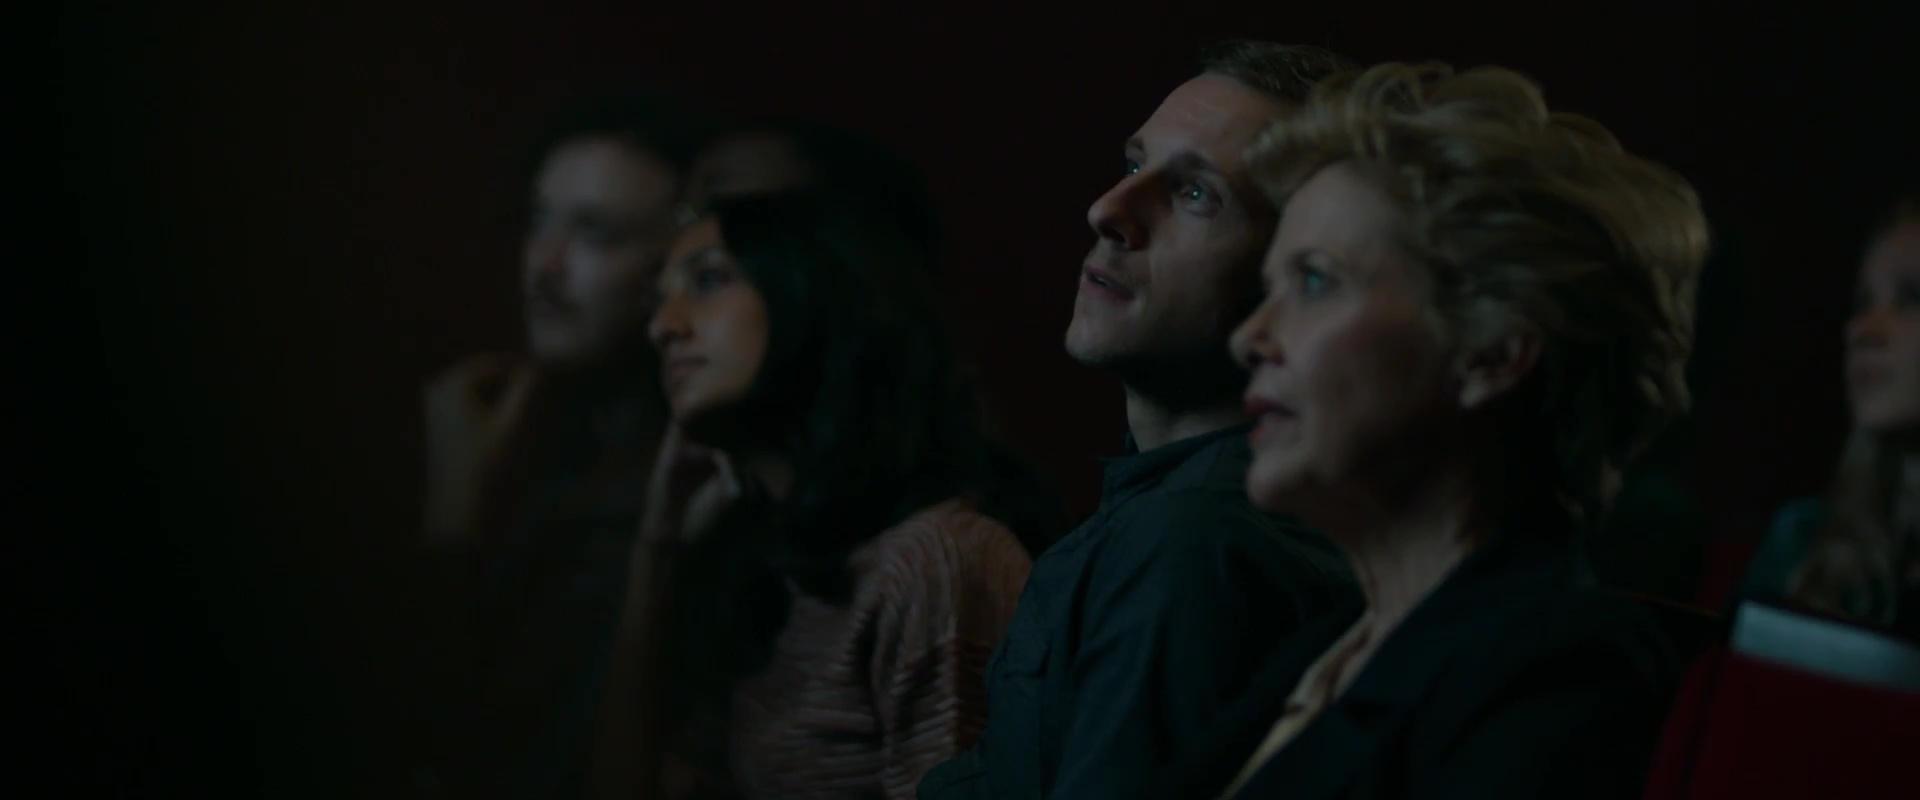 Film Stars Don't Die in Liverpool film still 3